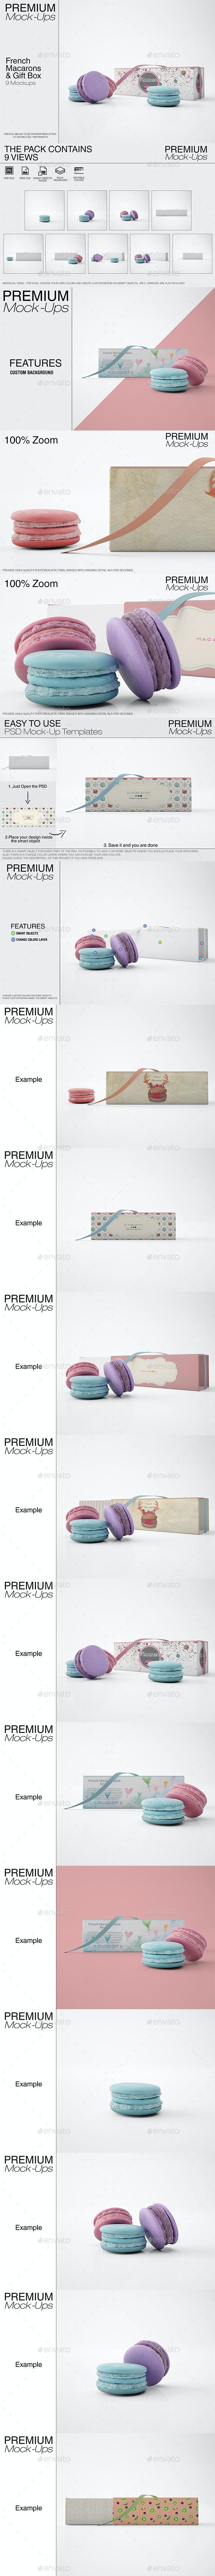 French Macarons & Gift Box Set - Print Product Mock-Ups